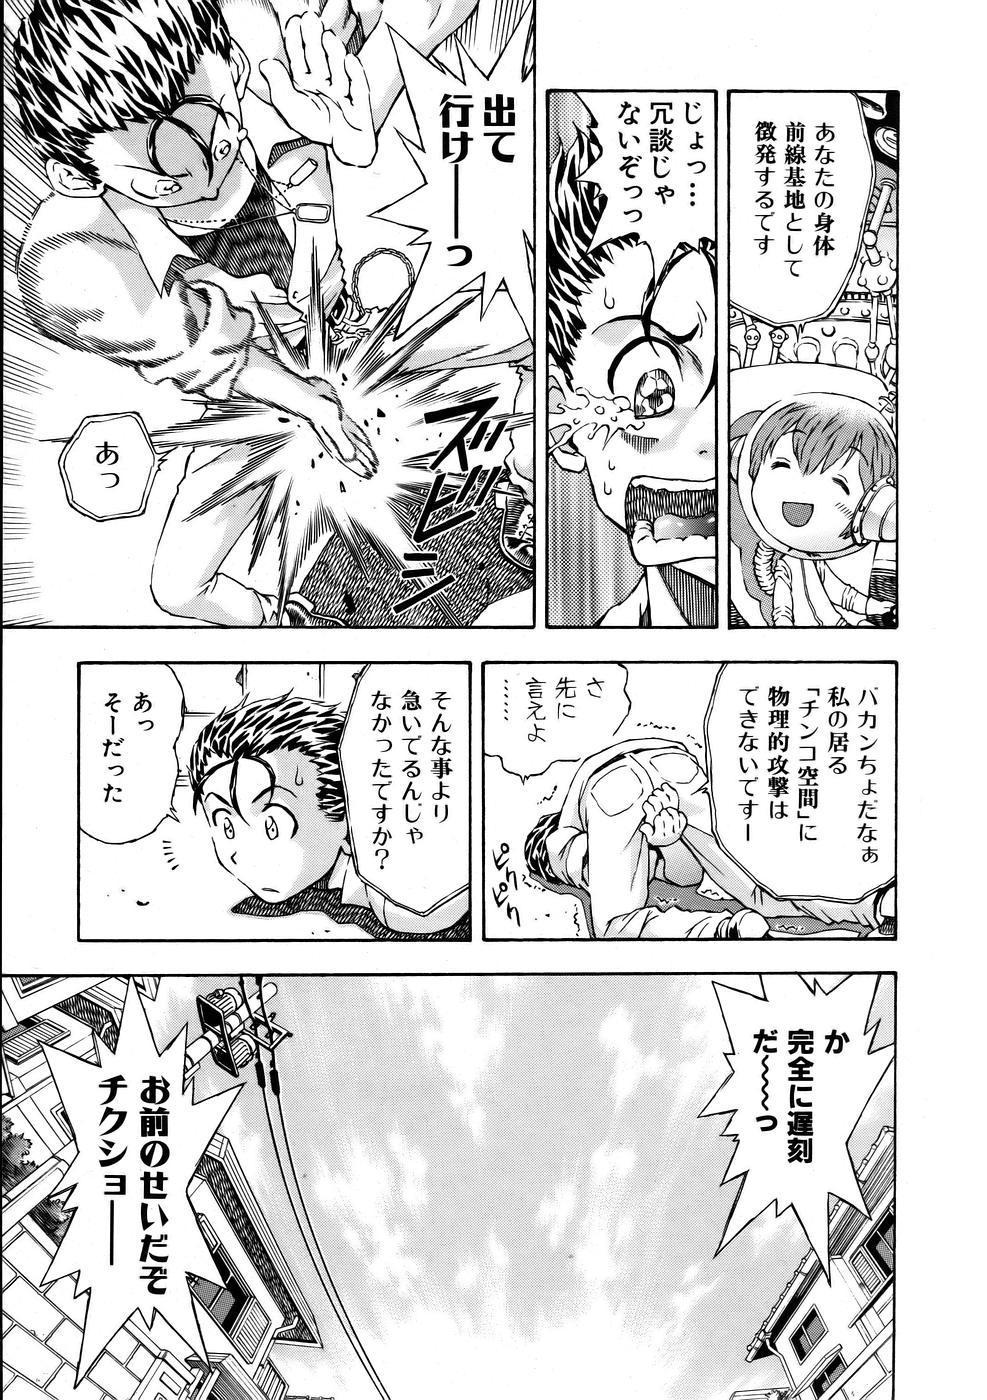 COMIC AUN 2005-10 Vol. 113 346